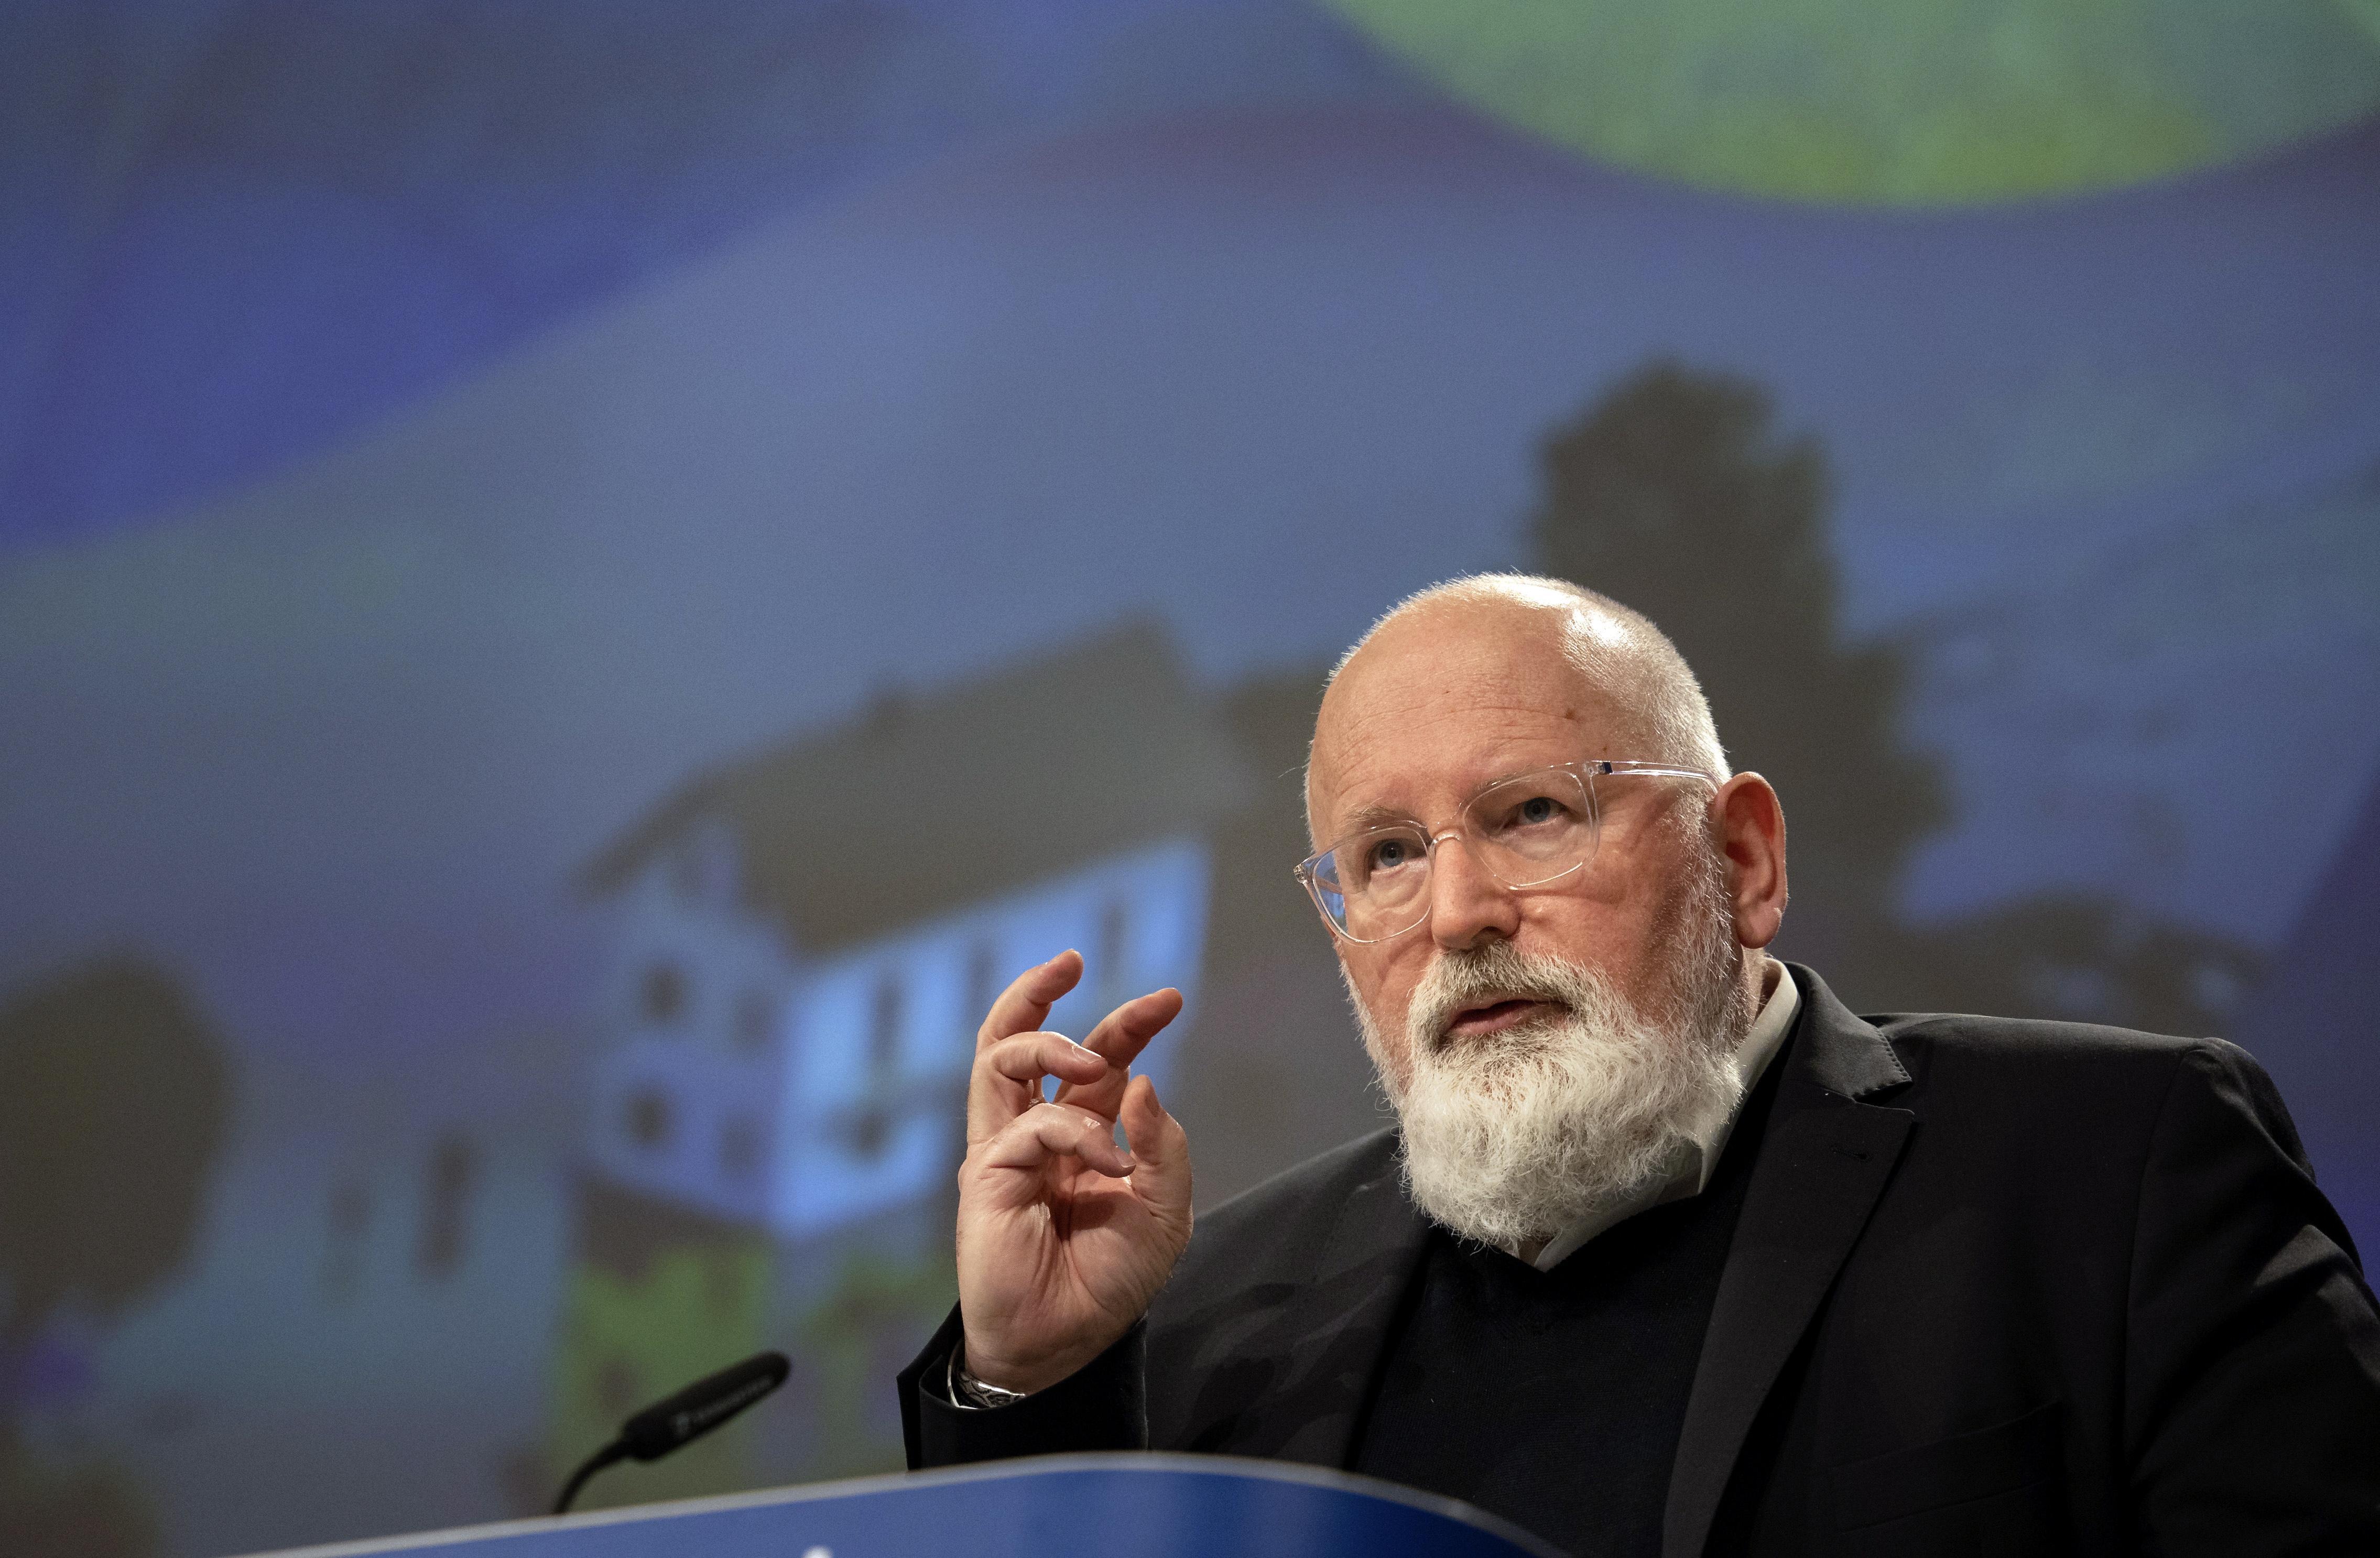 Frans Timmermans uitgeroepen tot Groenste Politicus